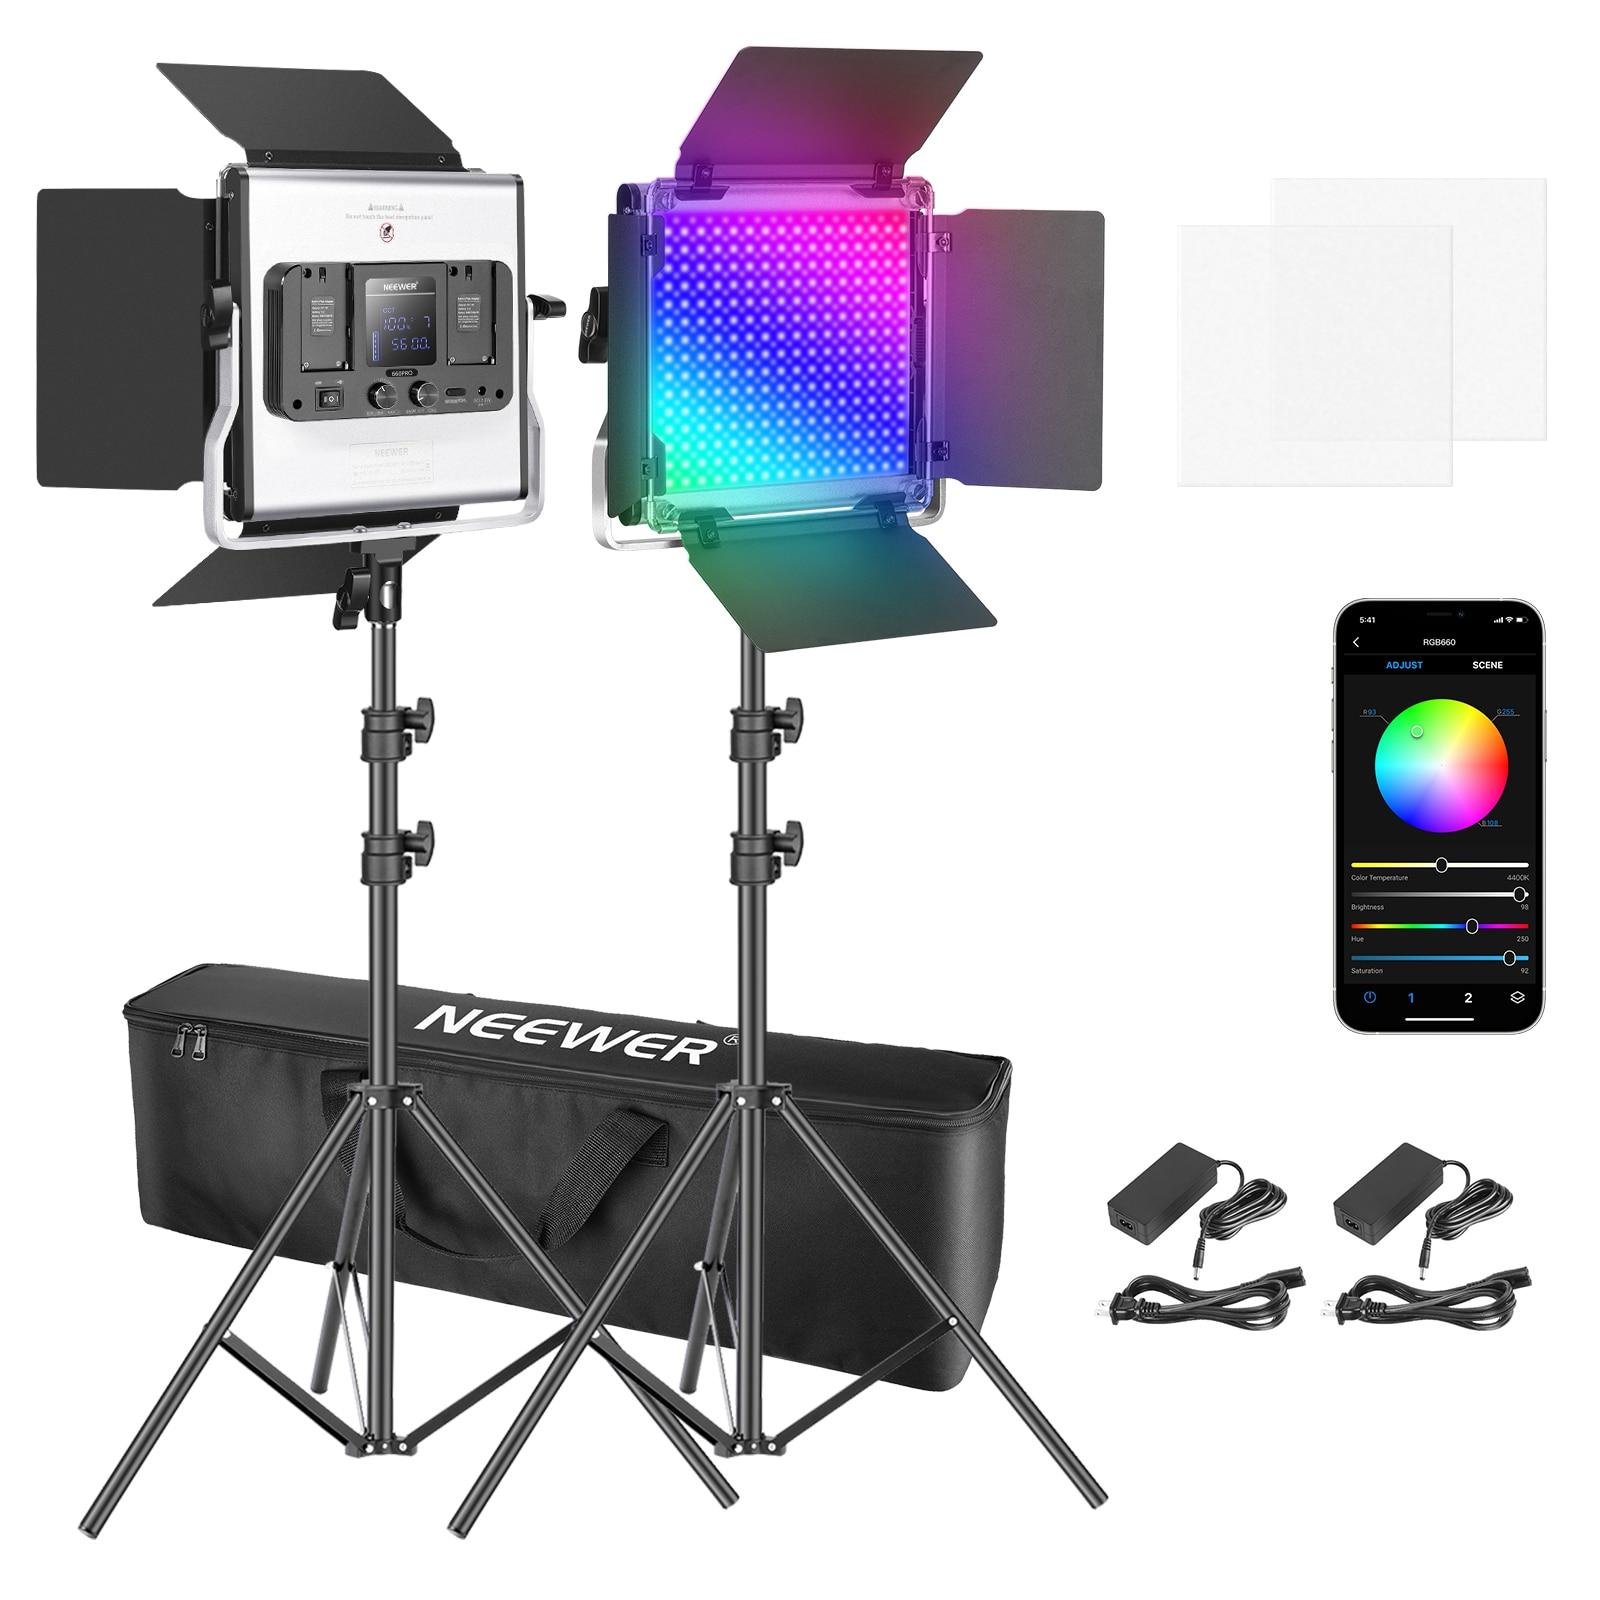 Neewer-660 مصباح Led RGB مع التحكم في التطبيق ، مجموعة إضاءة فيديو التصوير الفوتوغرافي مع حوامل وحقيبة ، 660 SMD Led CRI95 ، 2 أو 3 عبوات